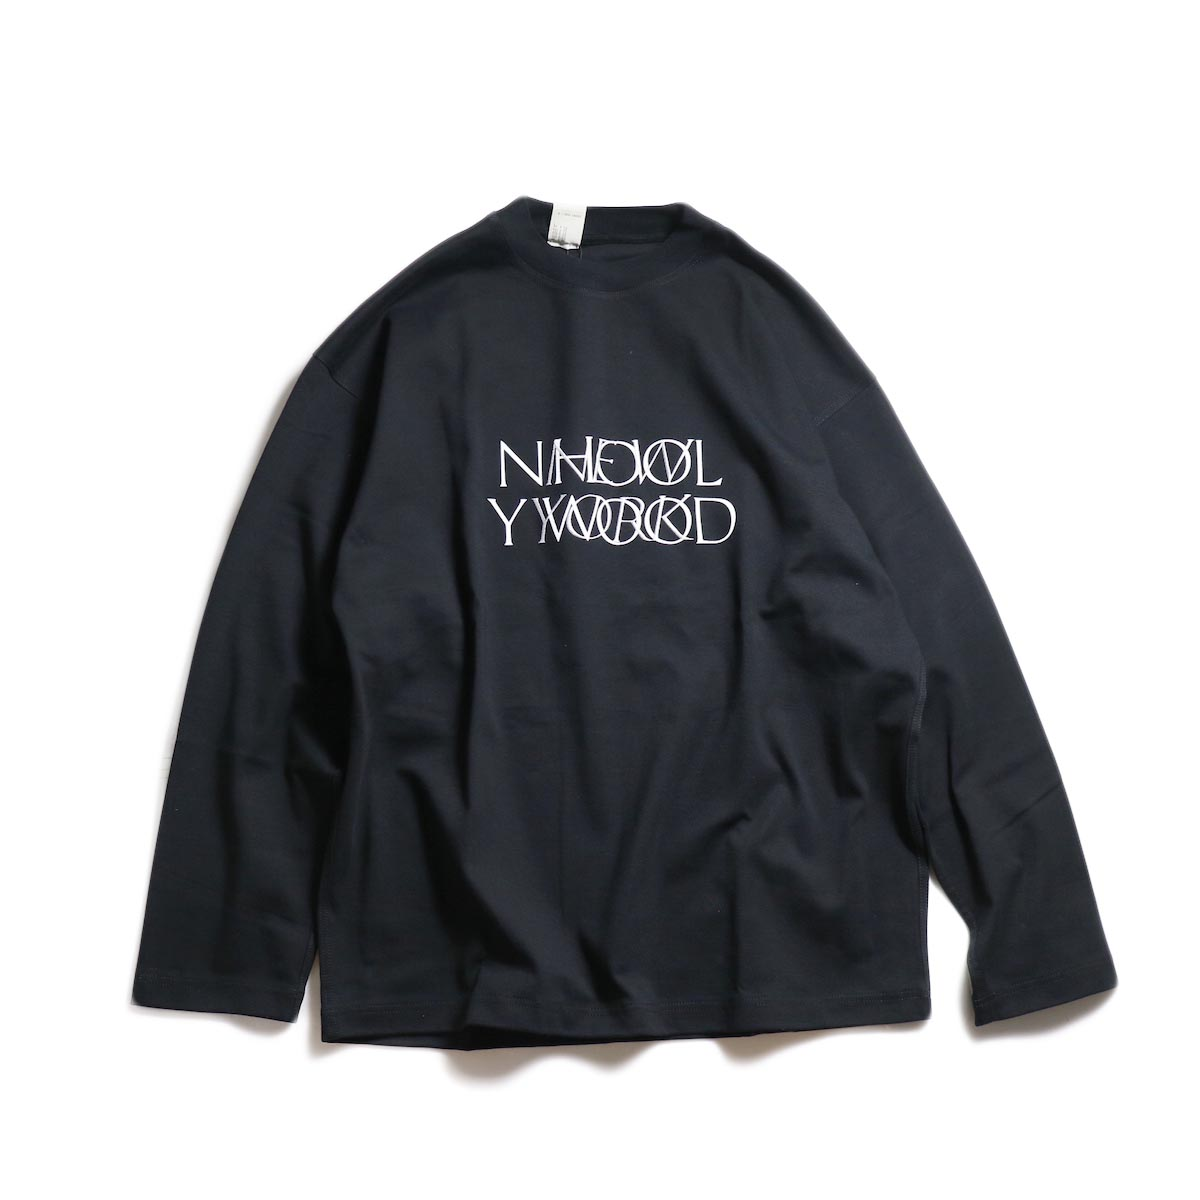 N.HOOLYWOOD / 192-CS15-025 Long Sleeve Logo T-Shirt -Black